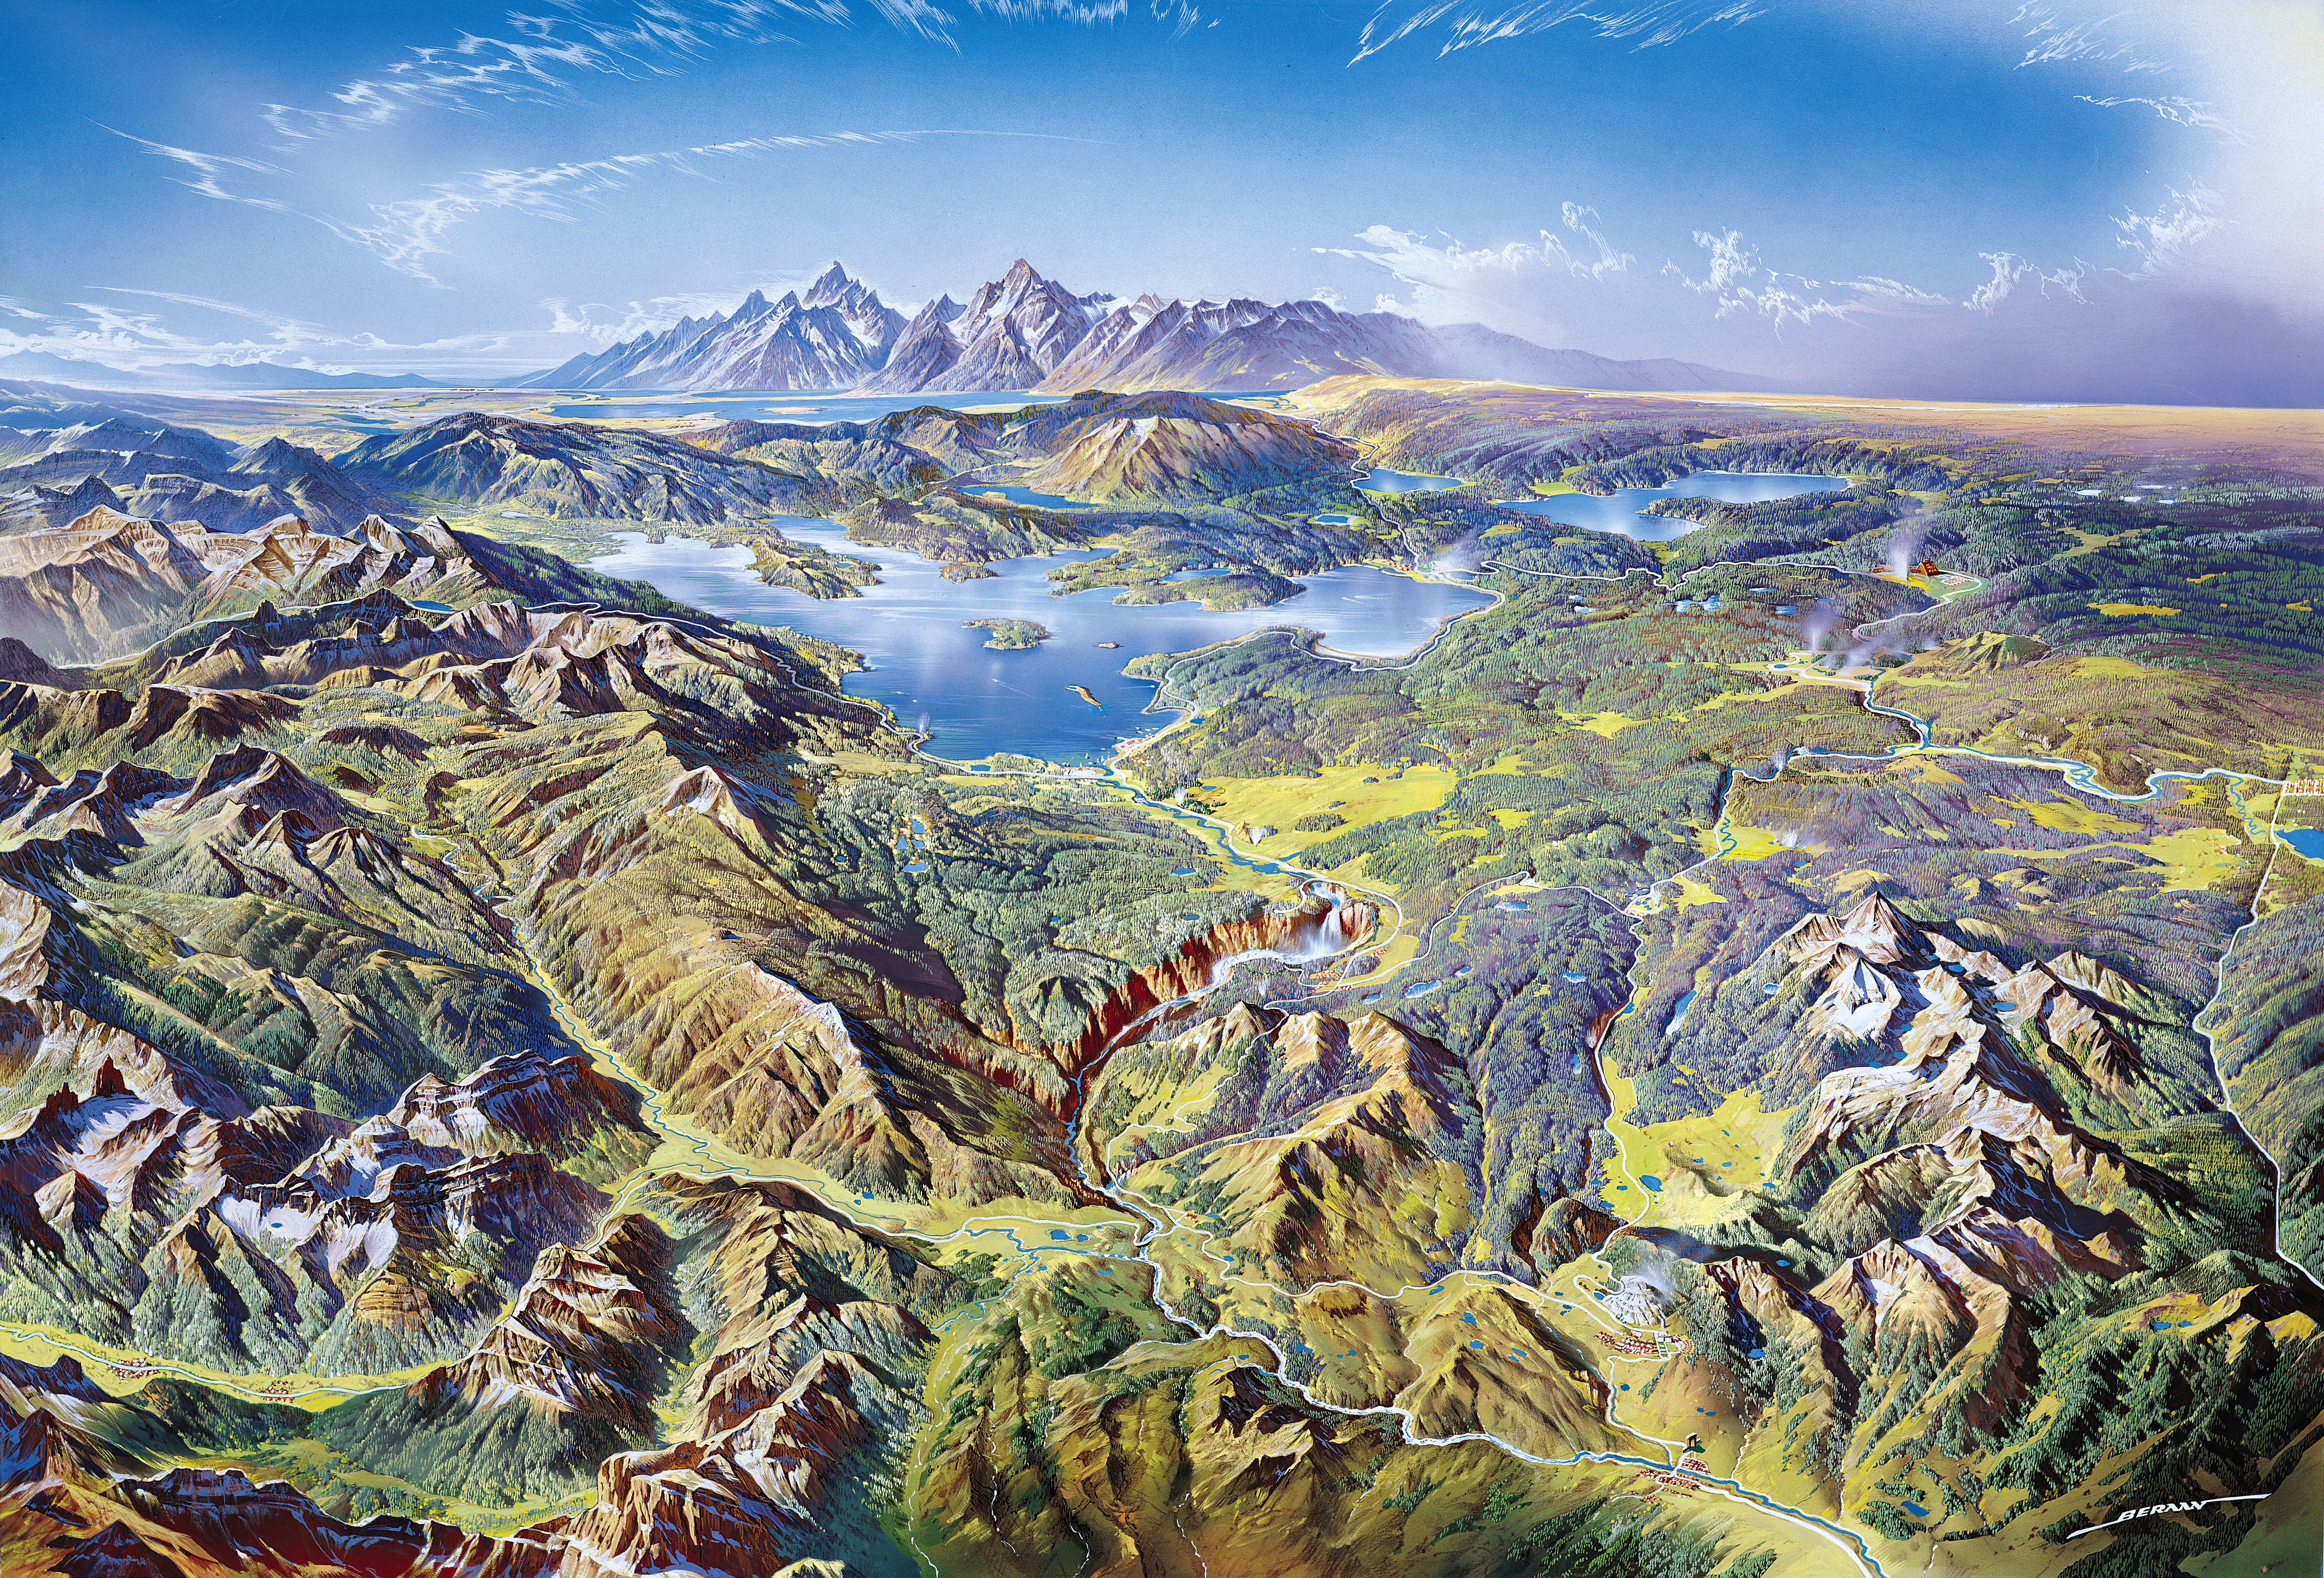 Yellowstone National Park Karte.File Heinrich Berann Nps Yellowstone Jpg Wikimedia Commons